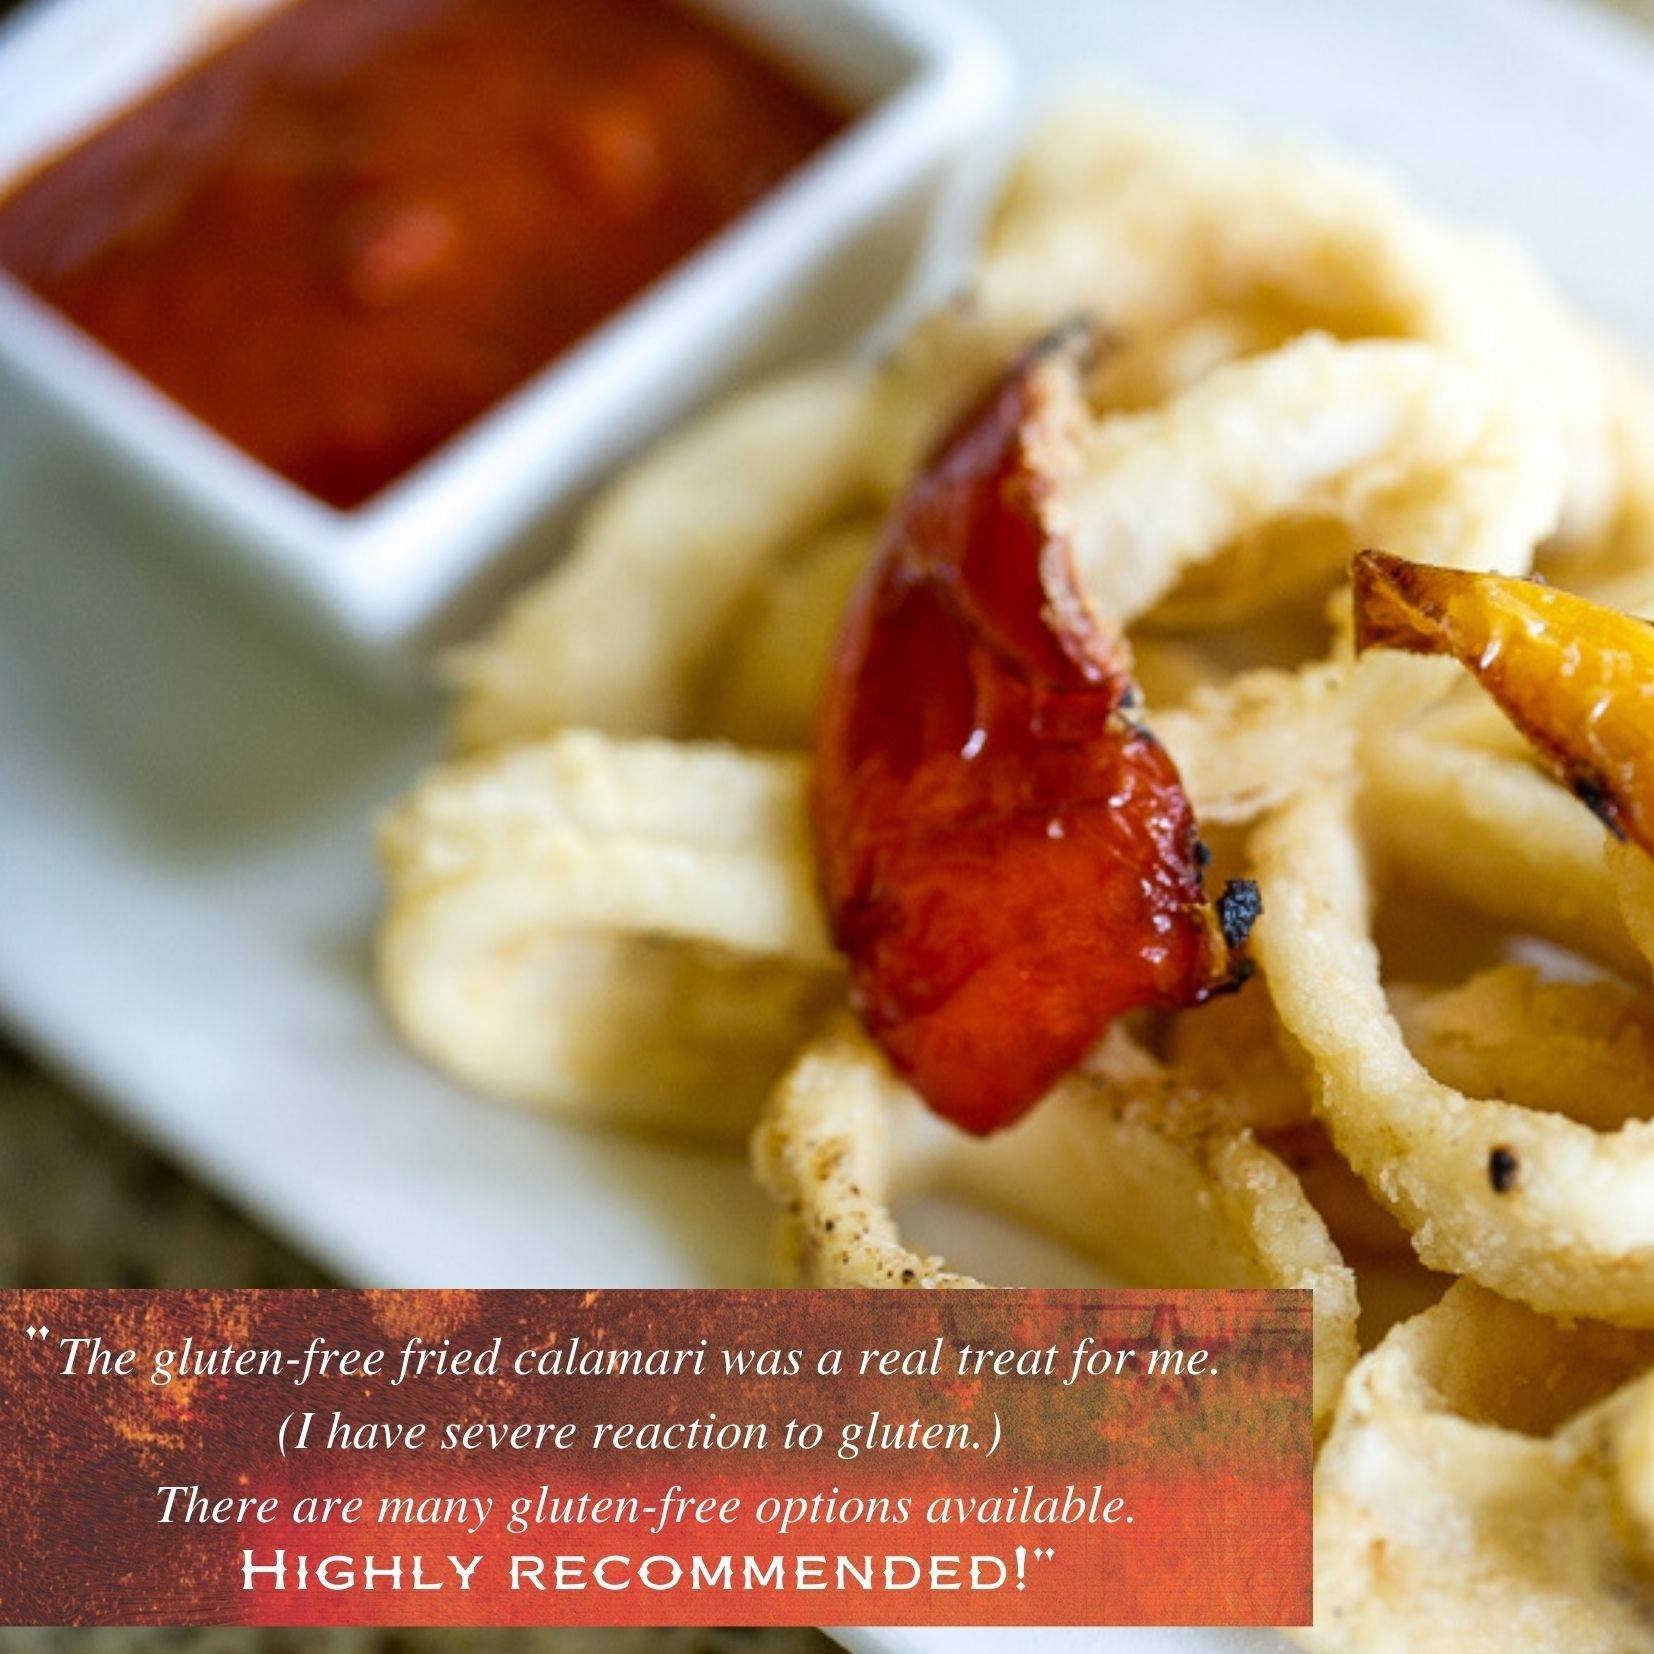 Tempranillo Restaurant reviews